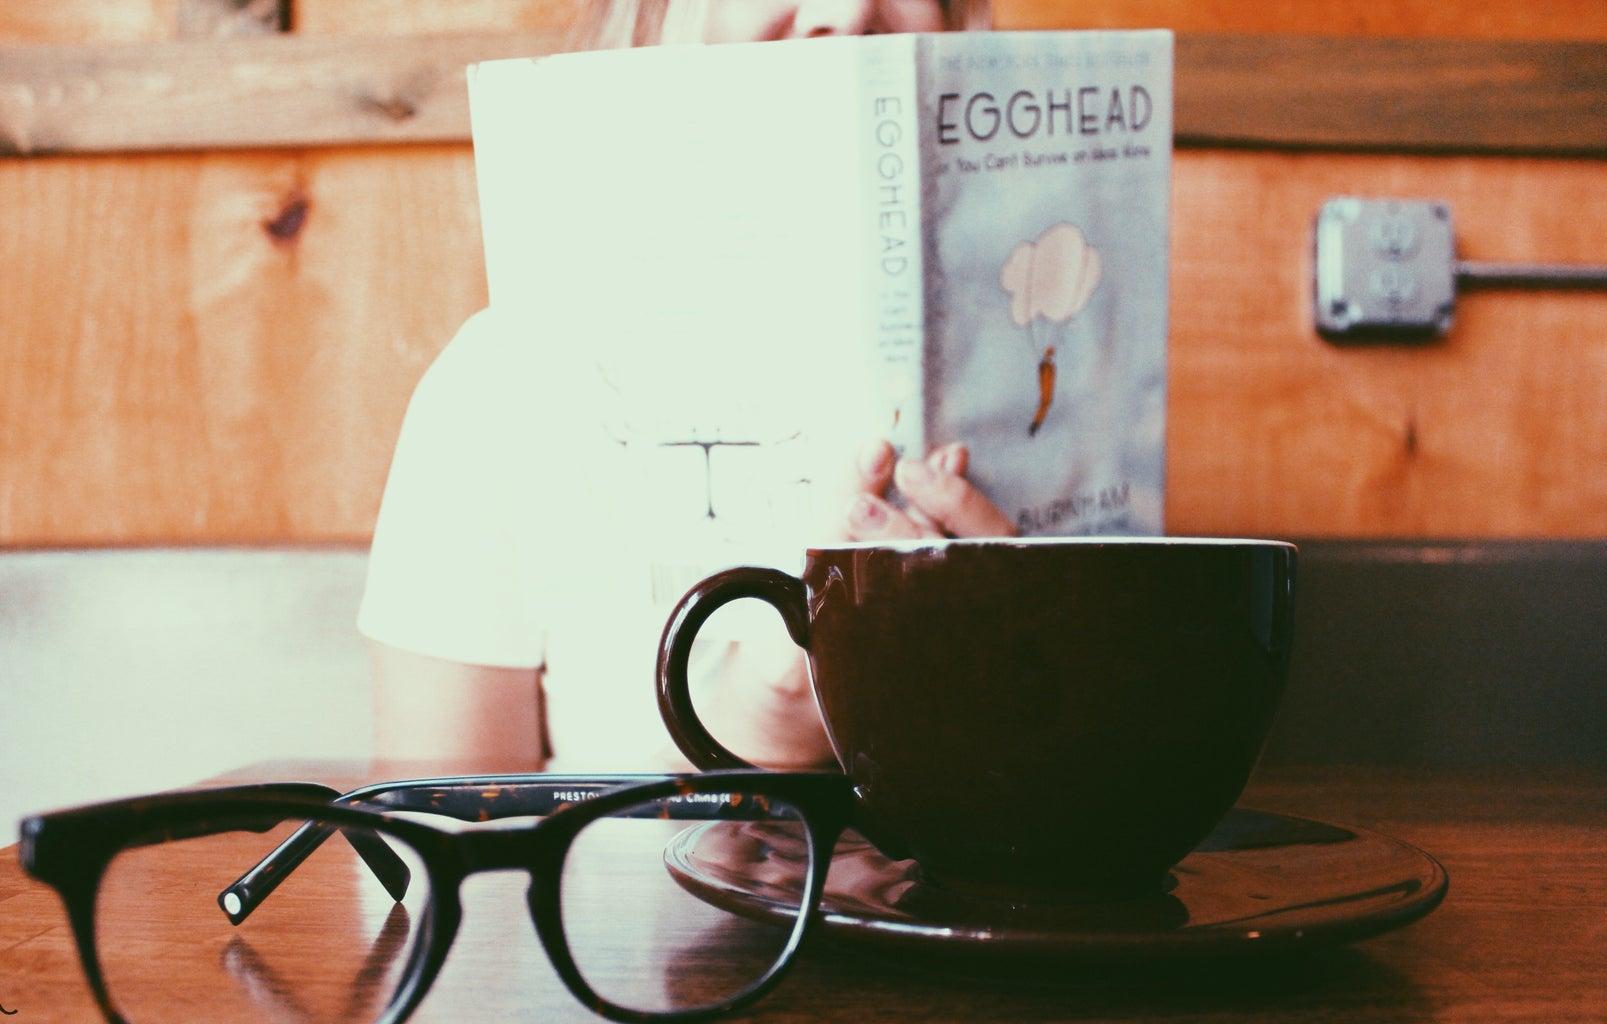 Amelia Kramer-Coffee Shop Glasses Book Latte